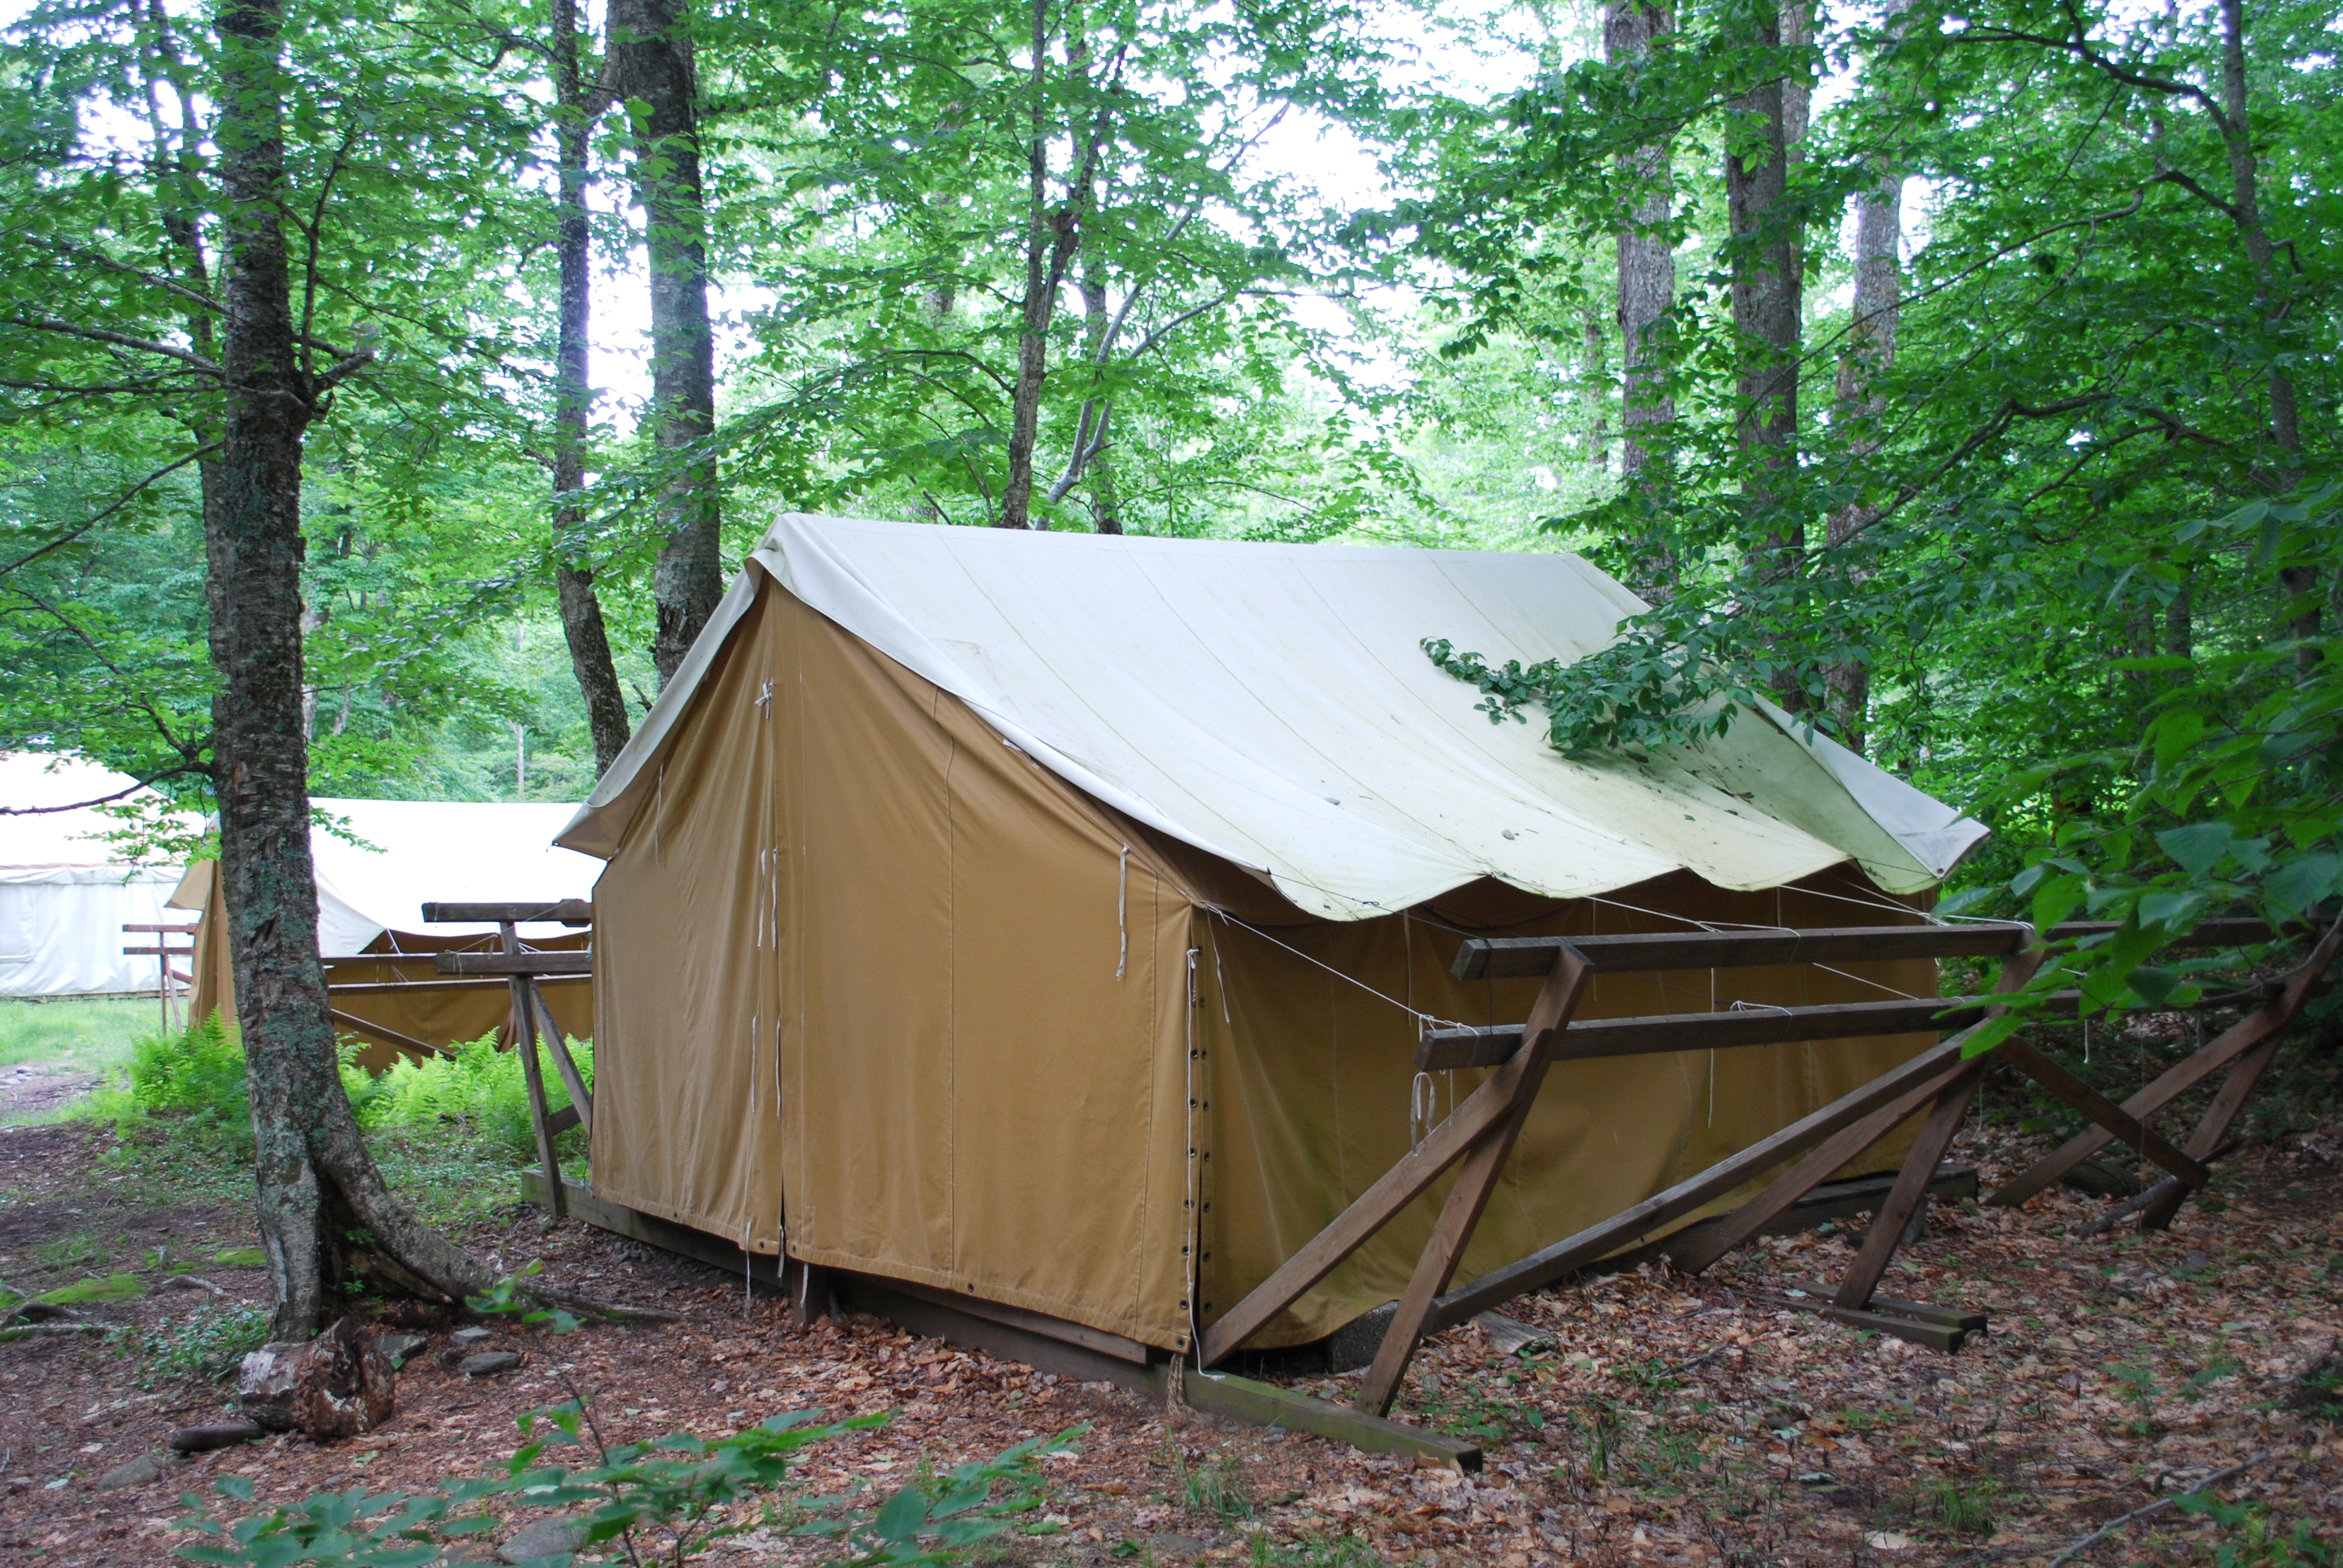 Platform Tents